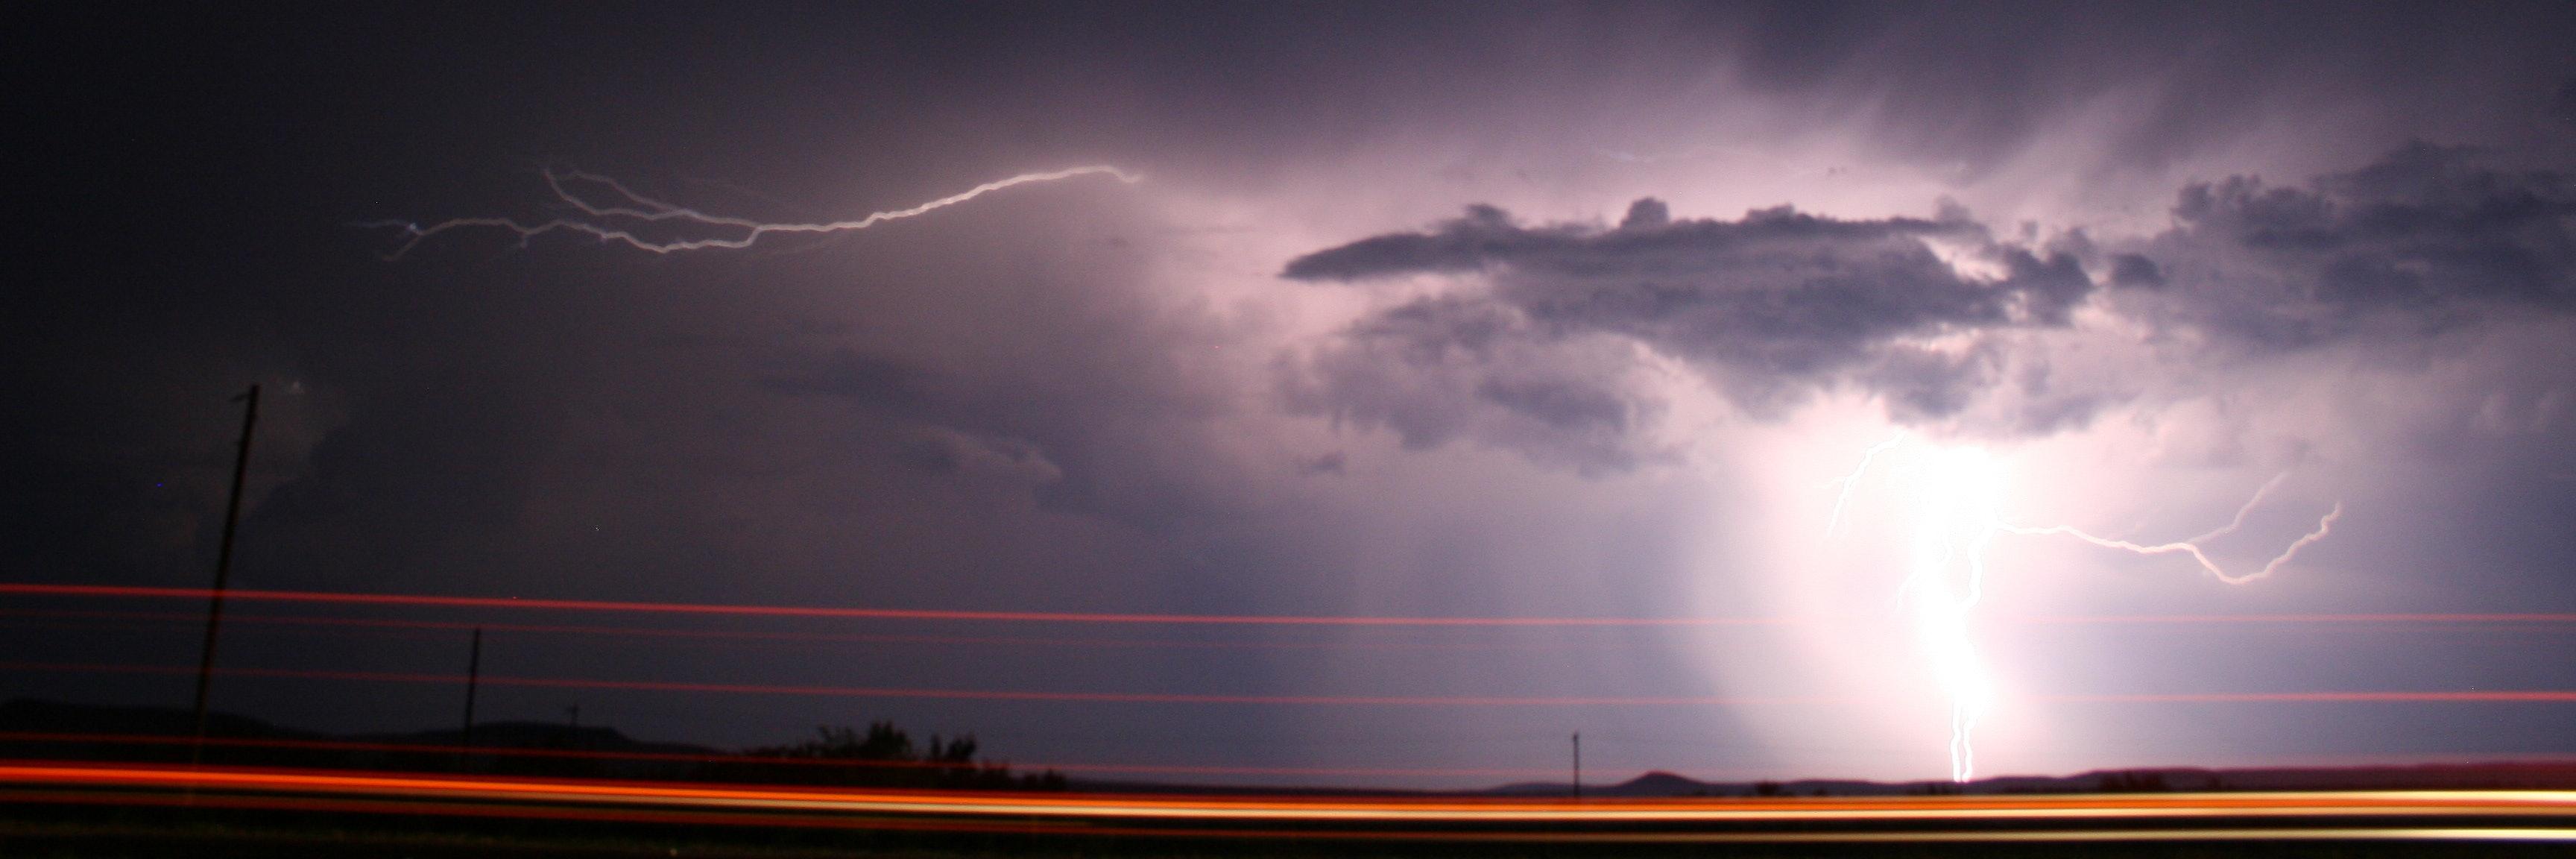 West Texas Lightning Storm